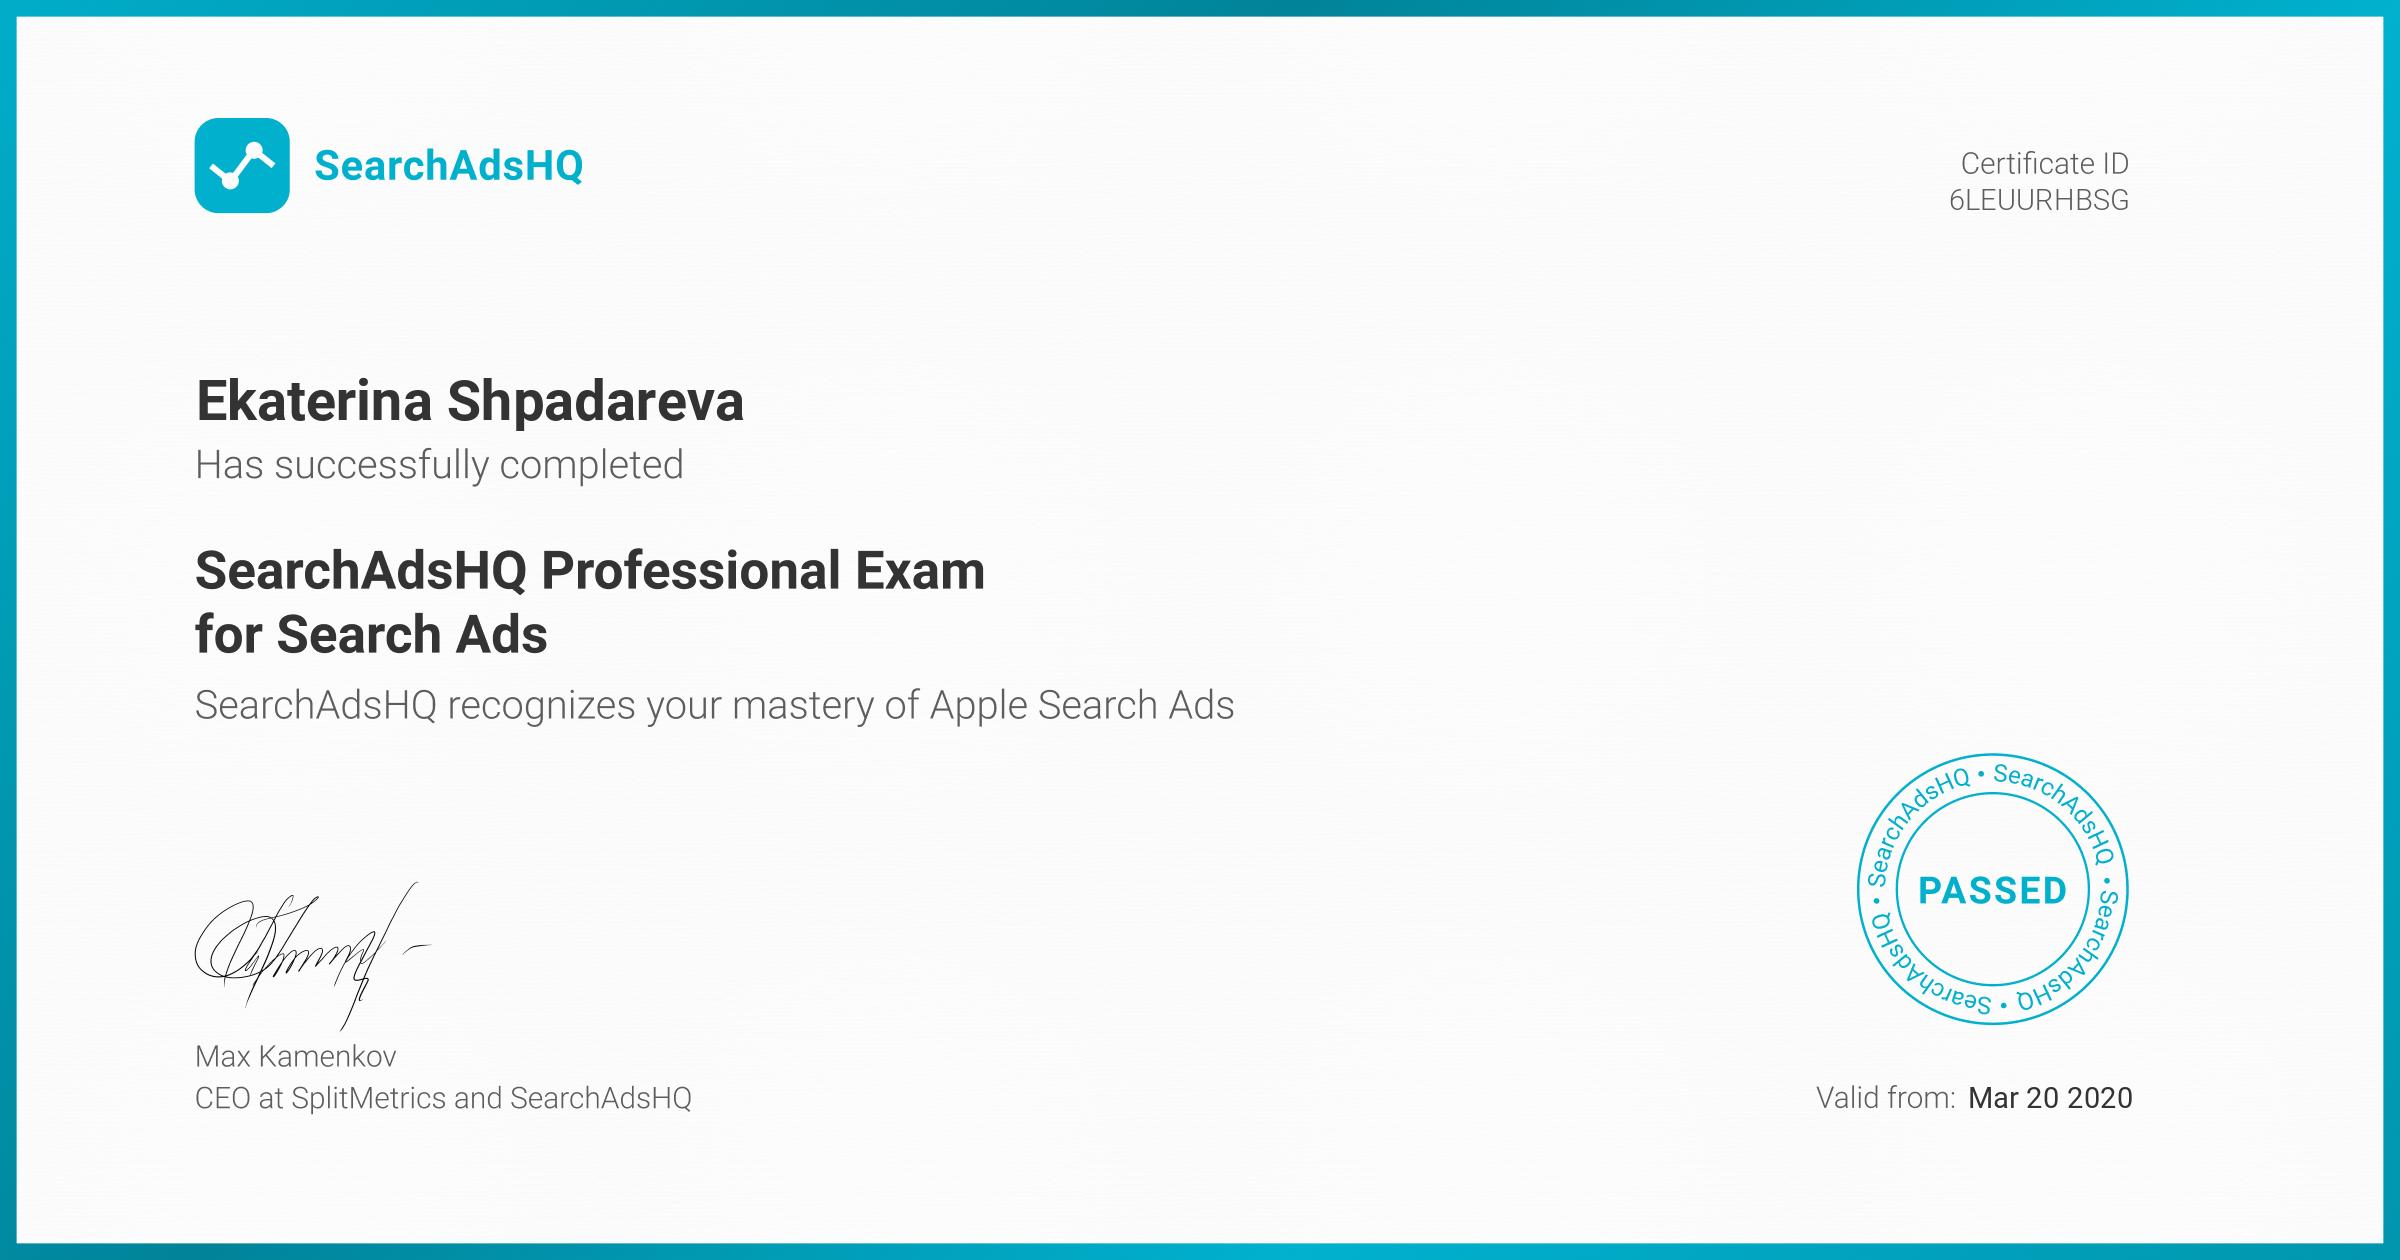 Certificate for Ekaterina Shpadareva | SearchAdsHQ Professional Exam for Search Ads